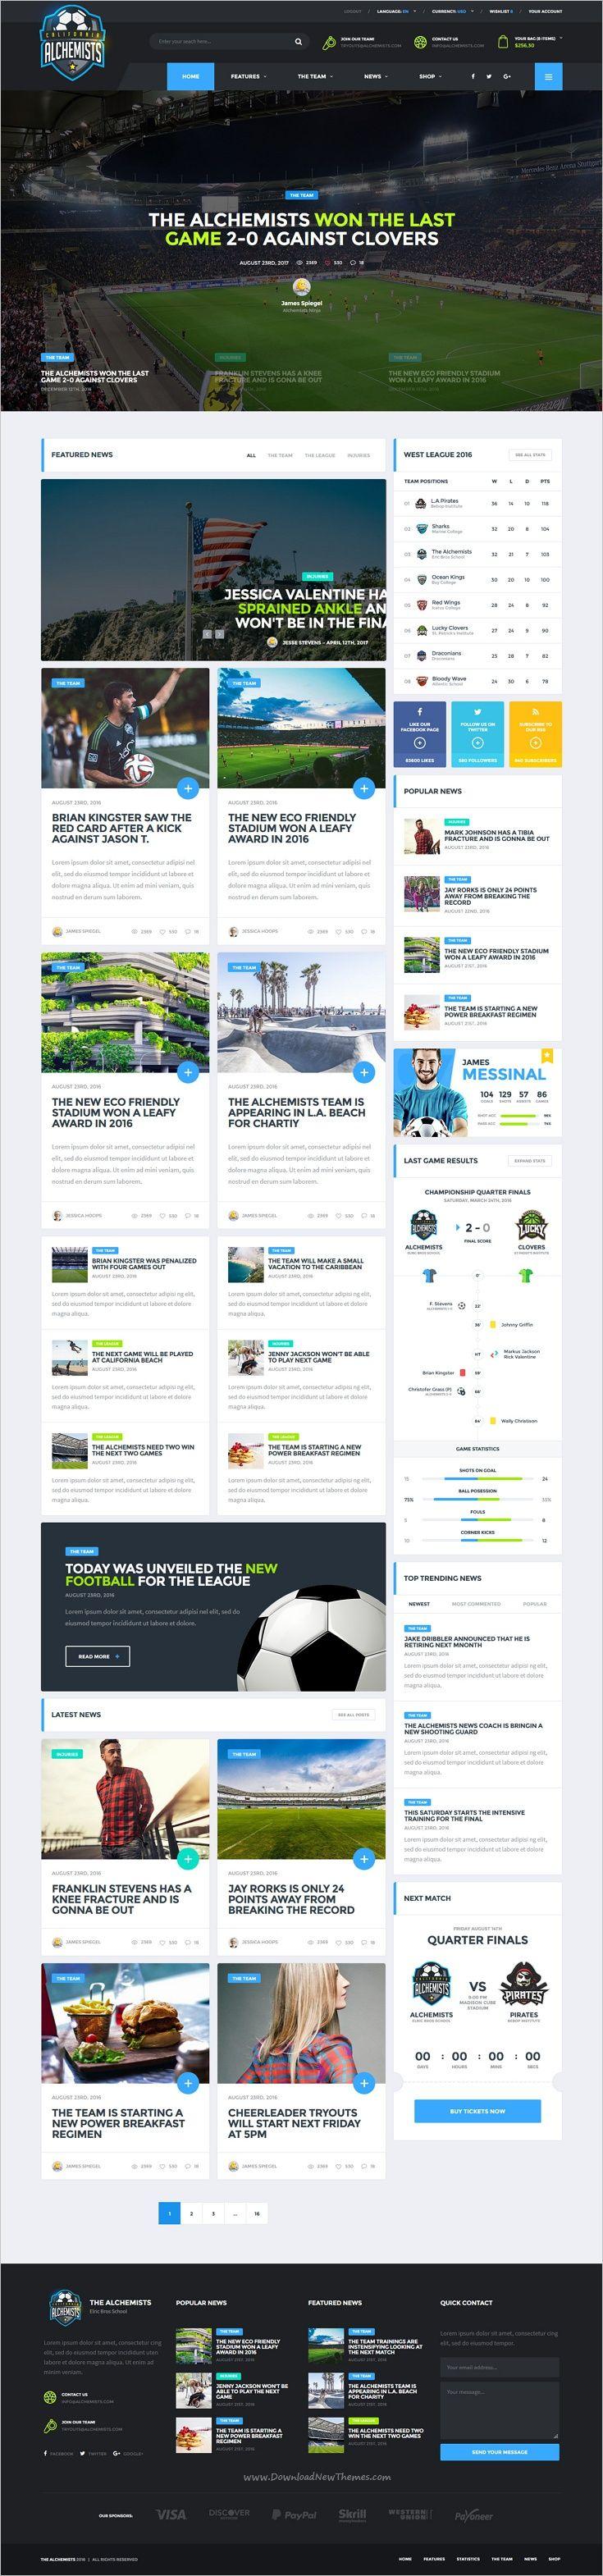 Alchemists   Basketball, Soccer, Football Sports Club And News HTML Template